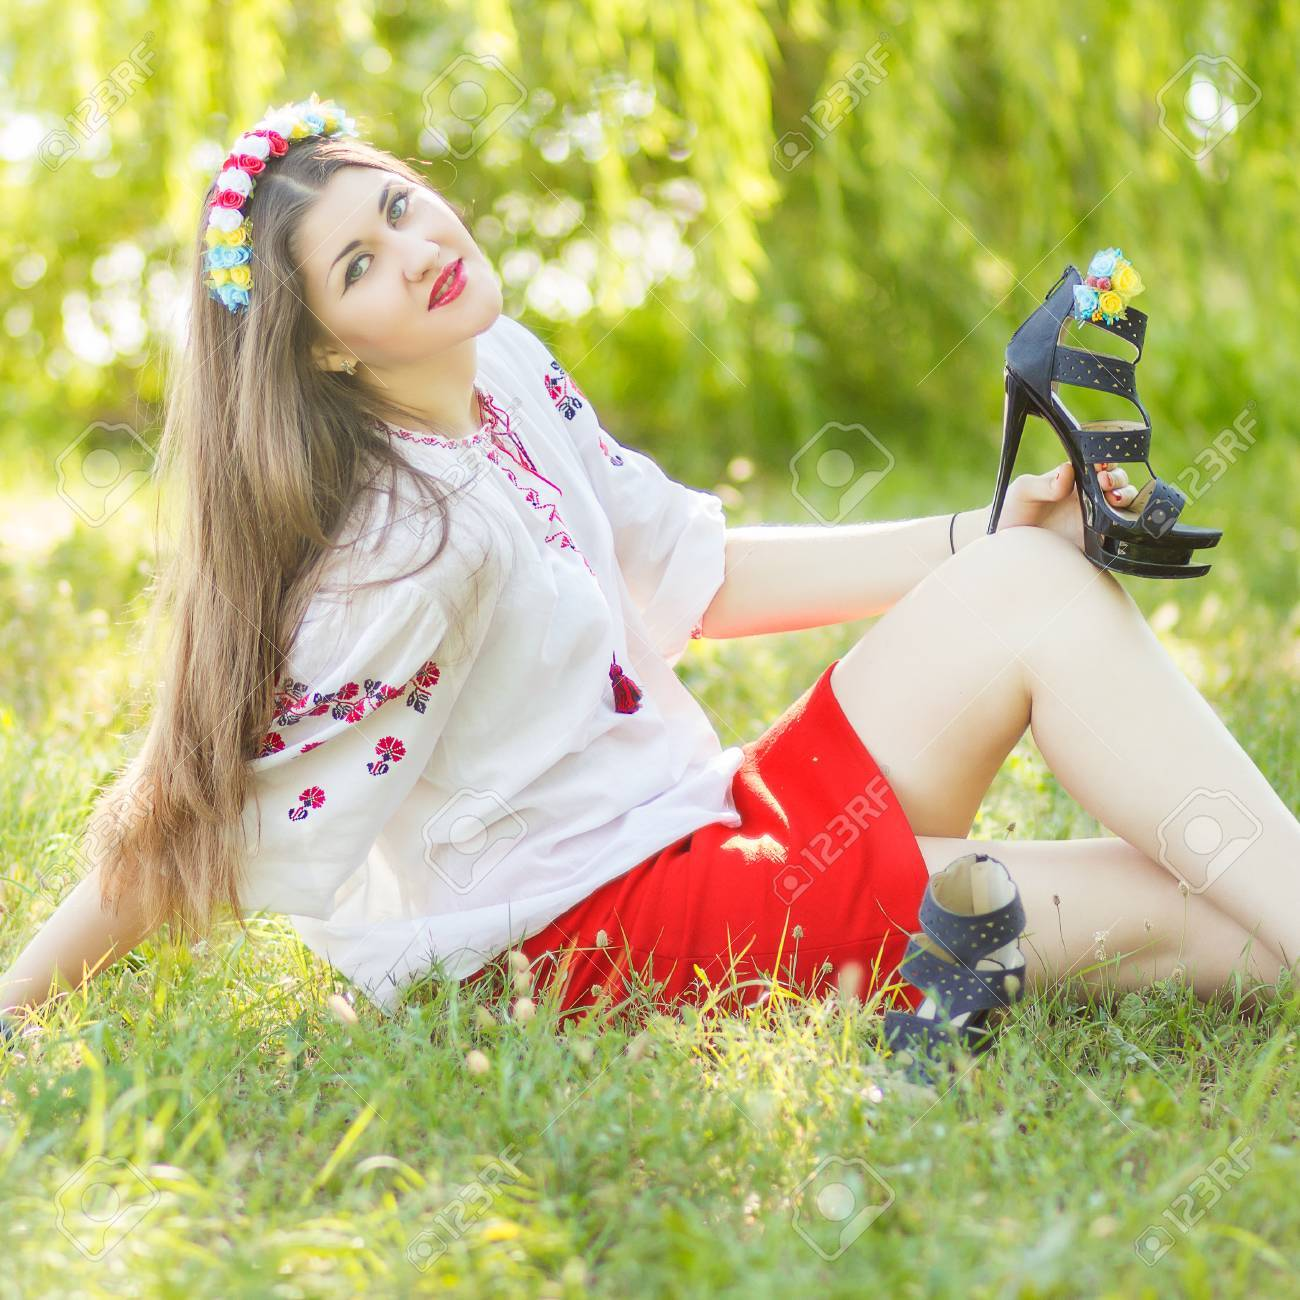 Девушка позирует лежа на траве фото фото 502-44